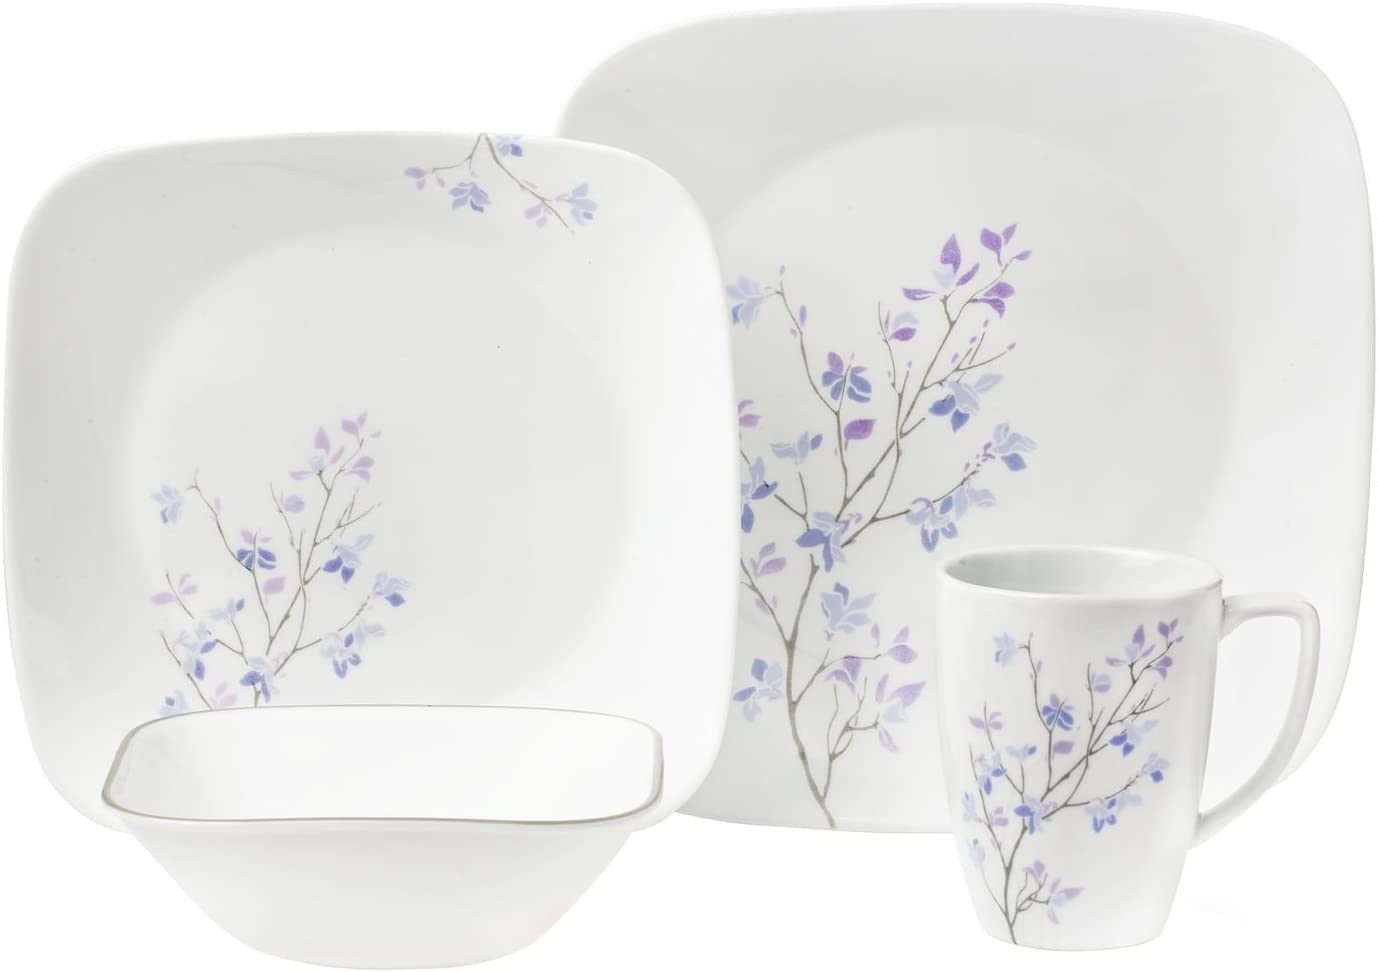 Corelle 16-Piece Vitrelle Glass Jacaranda Chip and Break Resistant Dinner Set, Service for 4, Purple